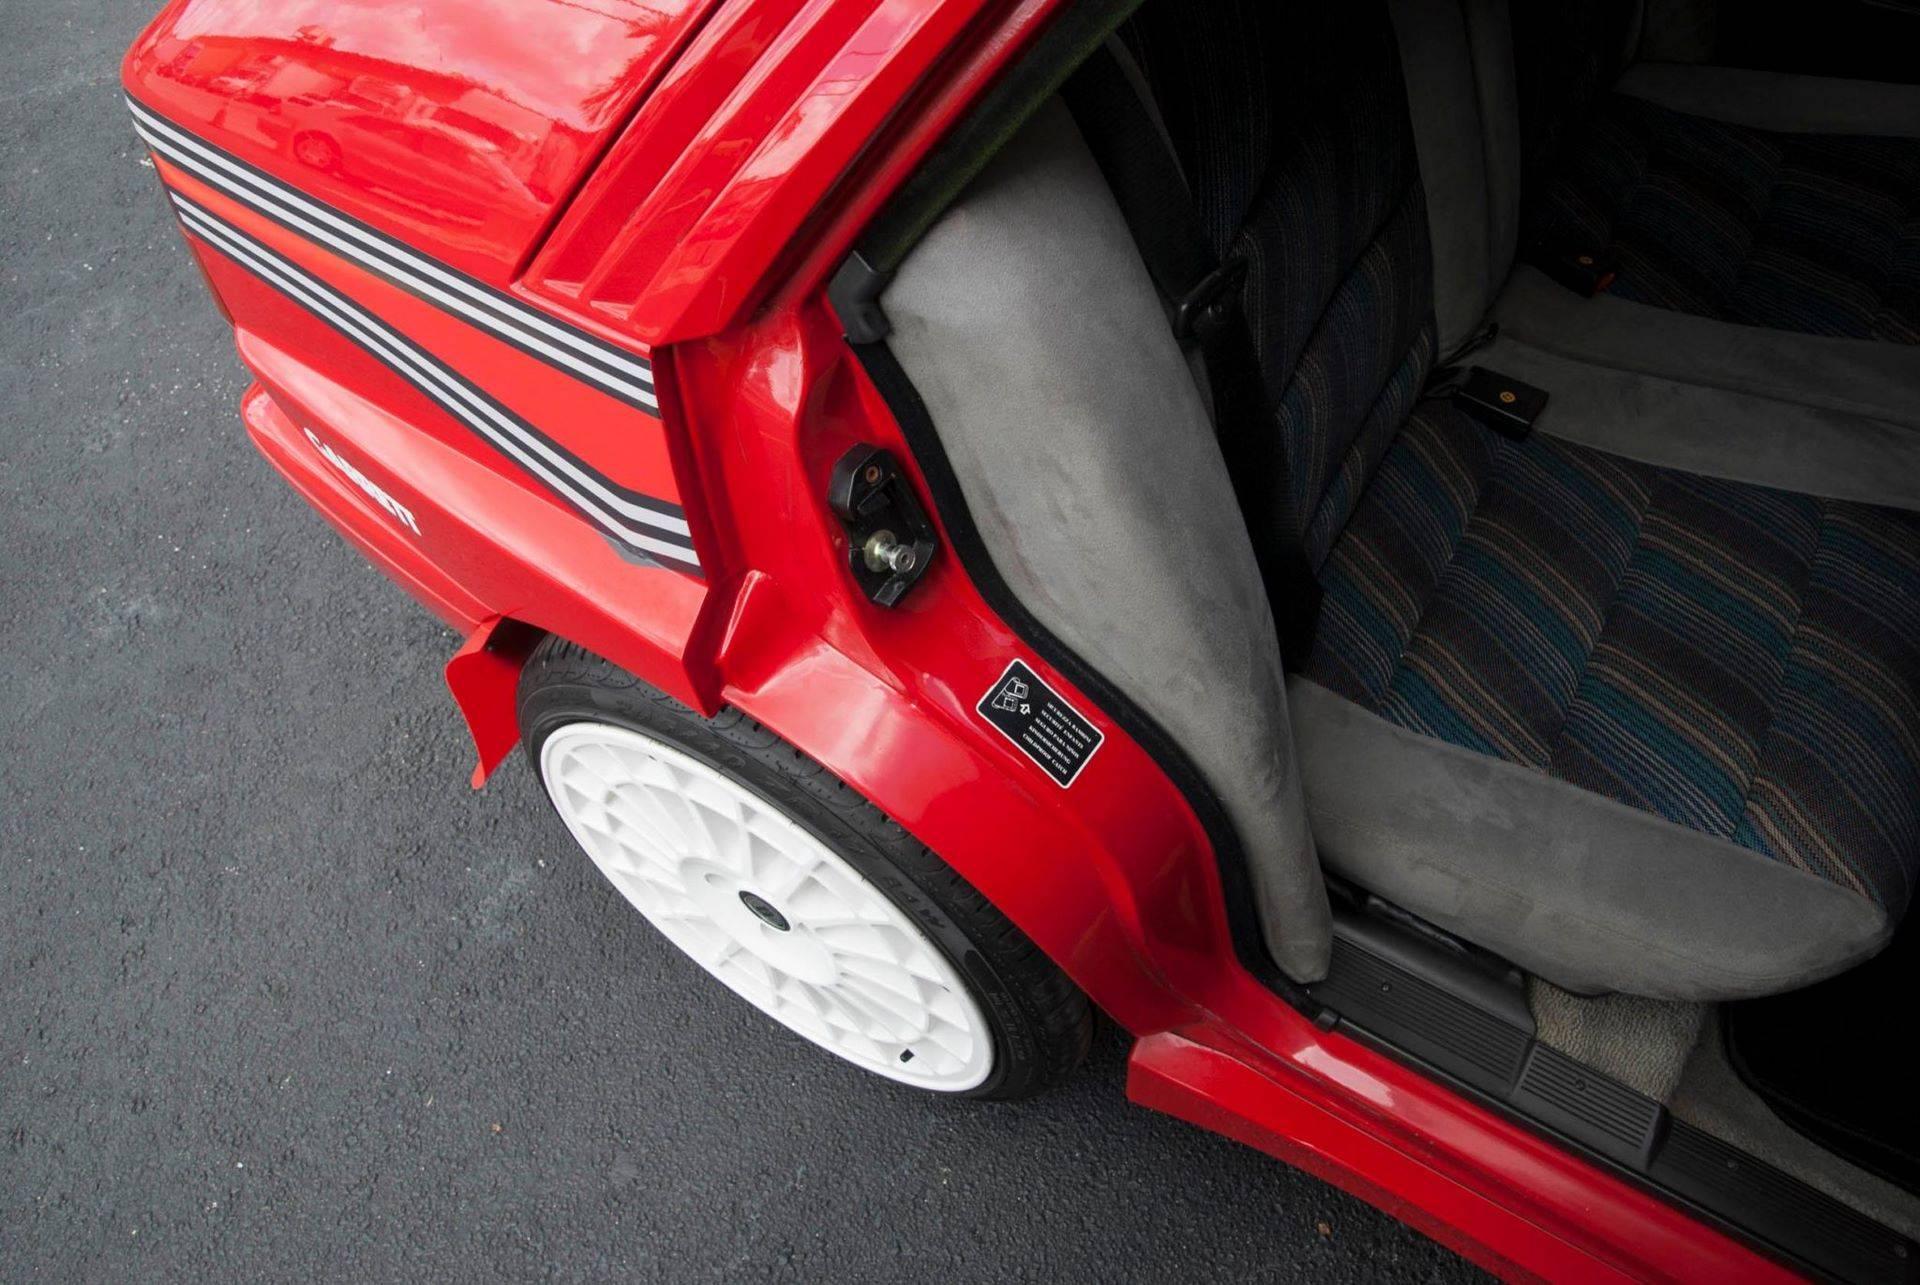 Lancia-Delta-Integrale-8V-1989-23